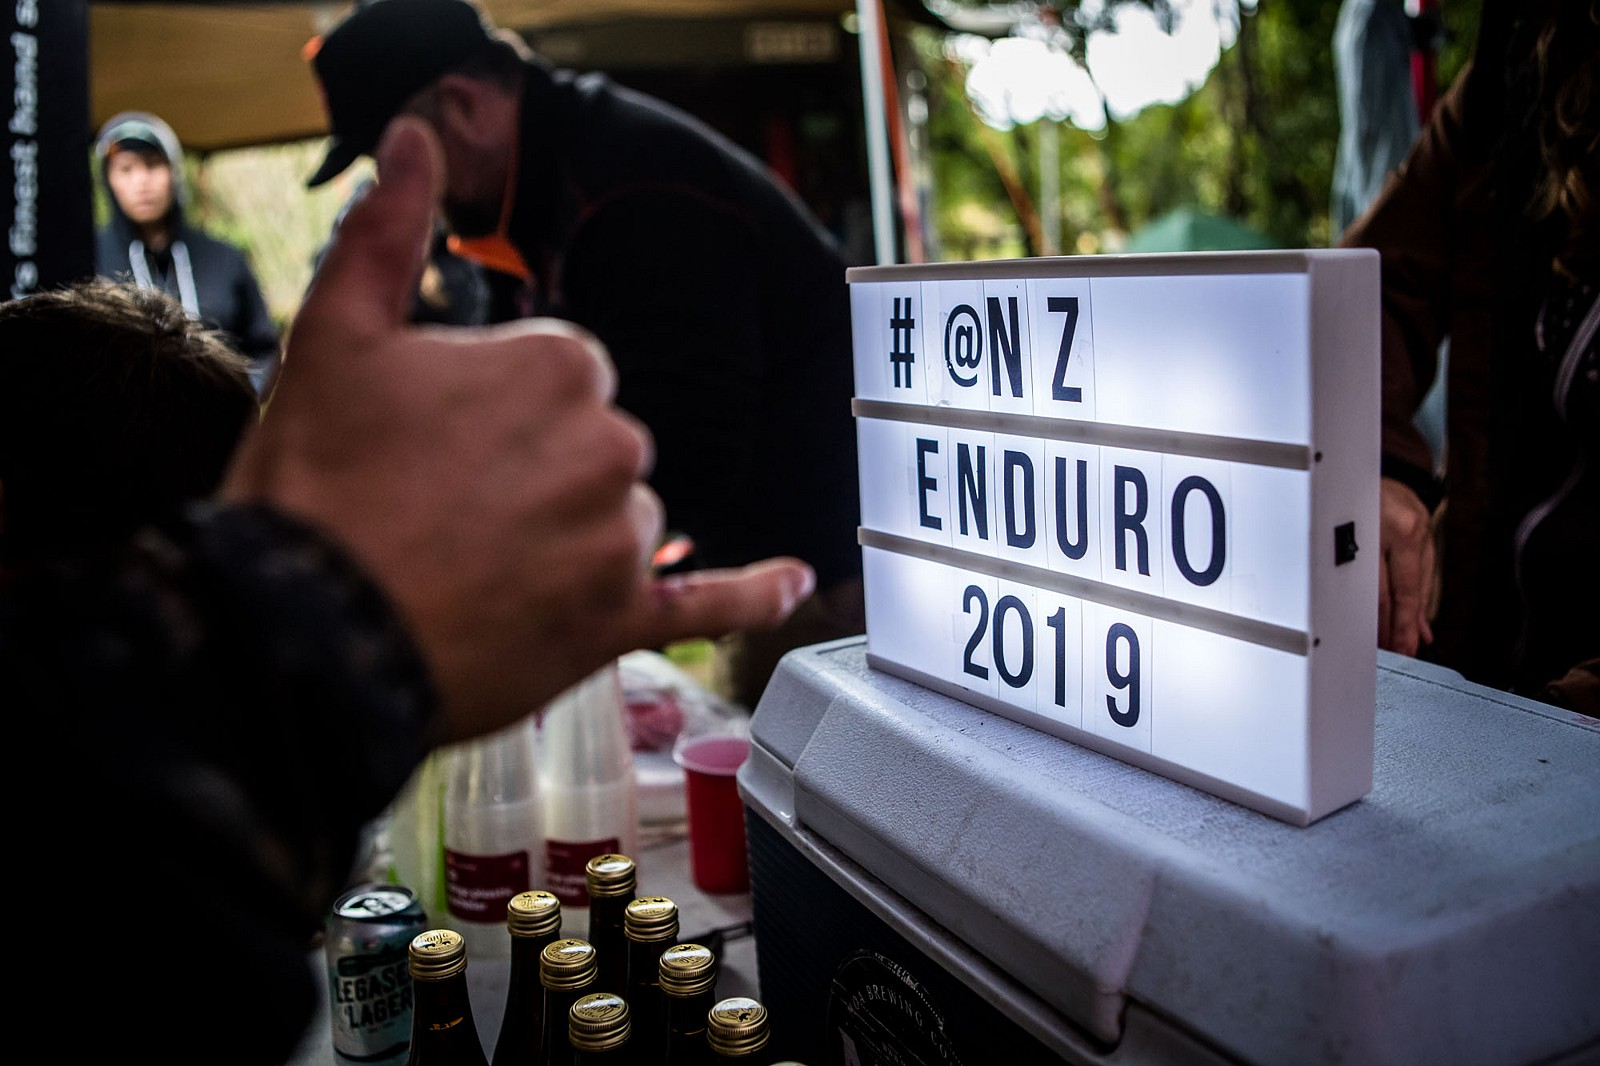 NZEnduro19 BB AS6I0585 - 2019 NZ Enduro Day 1 Photo Gallery - Mountain Biking Pictures - Vital MTB